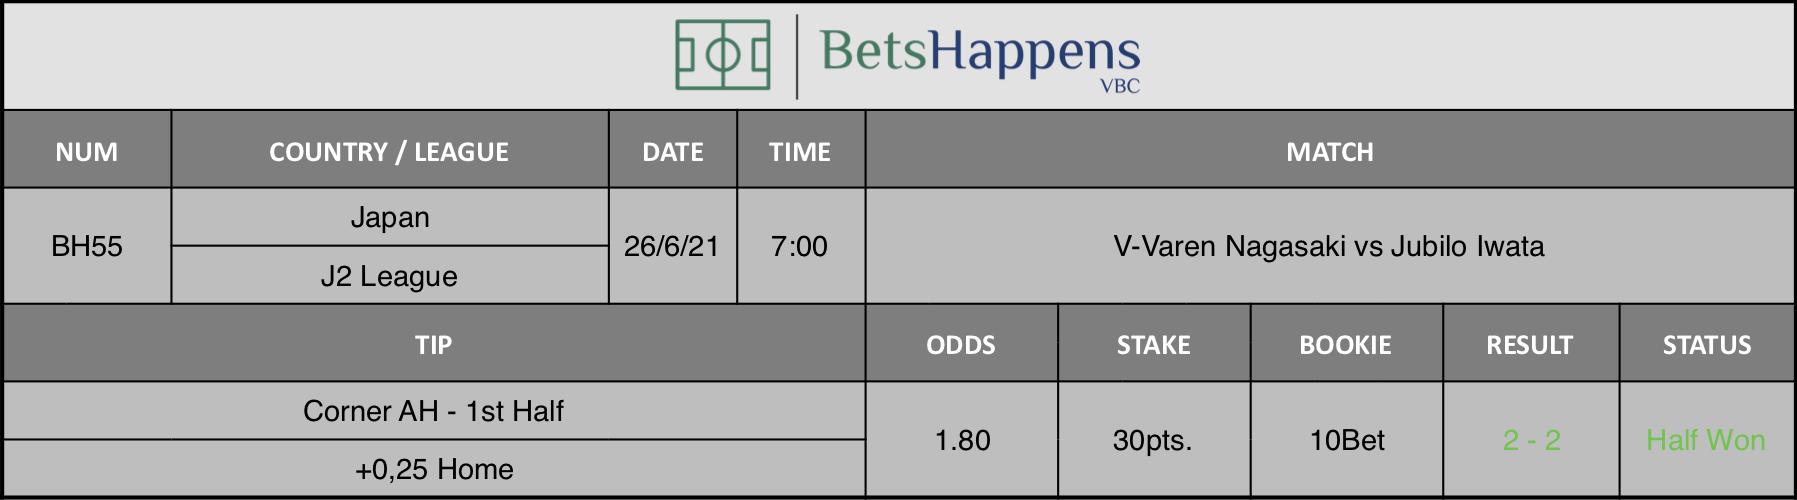 Results of our tip for the V-Varen Nagasaki vs Jubilo Iwata match Corner AH - 1st Half +0,25 Home is recommended.